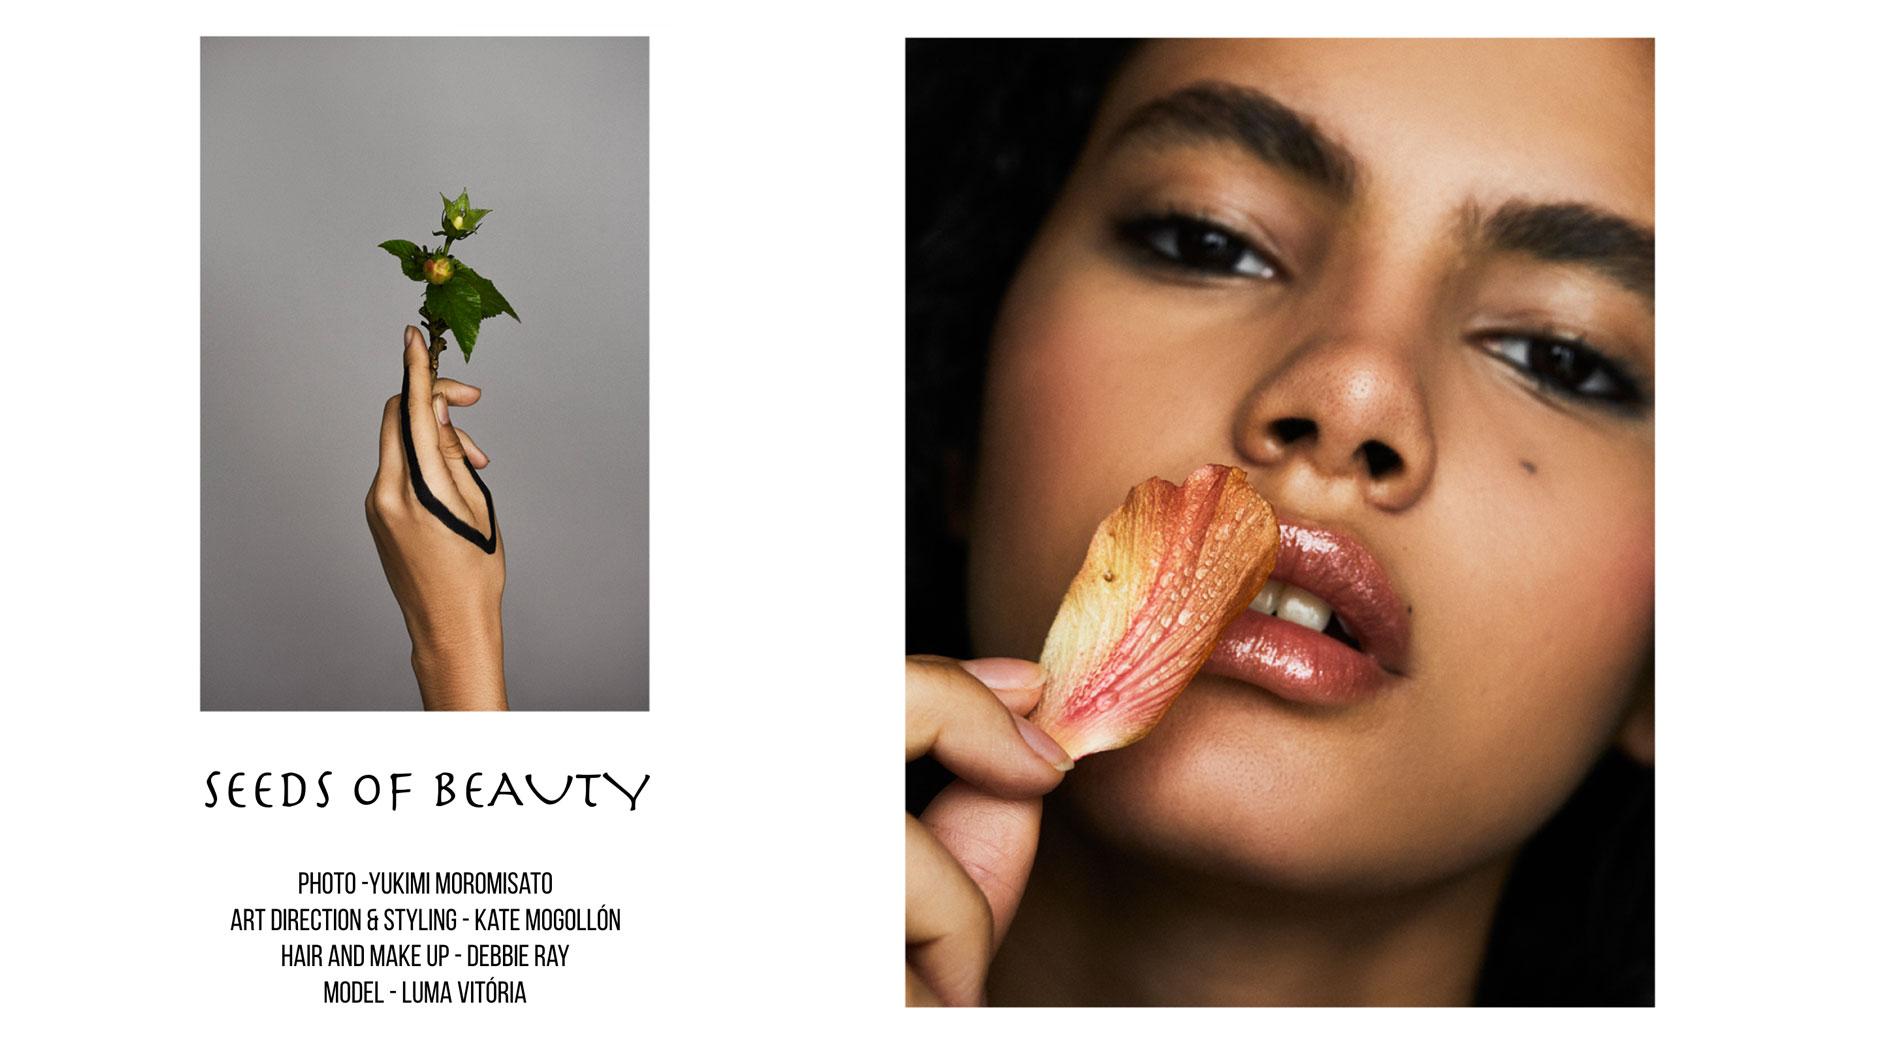 Seeds-01–LUMA—Photography.-Yukimi-Moromisato-Art-Direction-&-Styling.-Kate-Mogollón-Hair-&-Make-Up.-Debbie-Ray-Model.-Luma-Vitória-@-WeLove-Models-Perú-@amusemag-amusemag